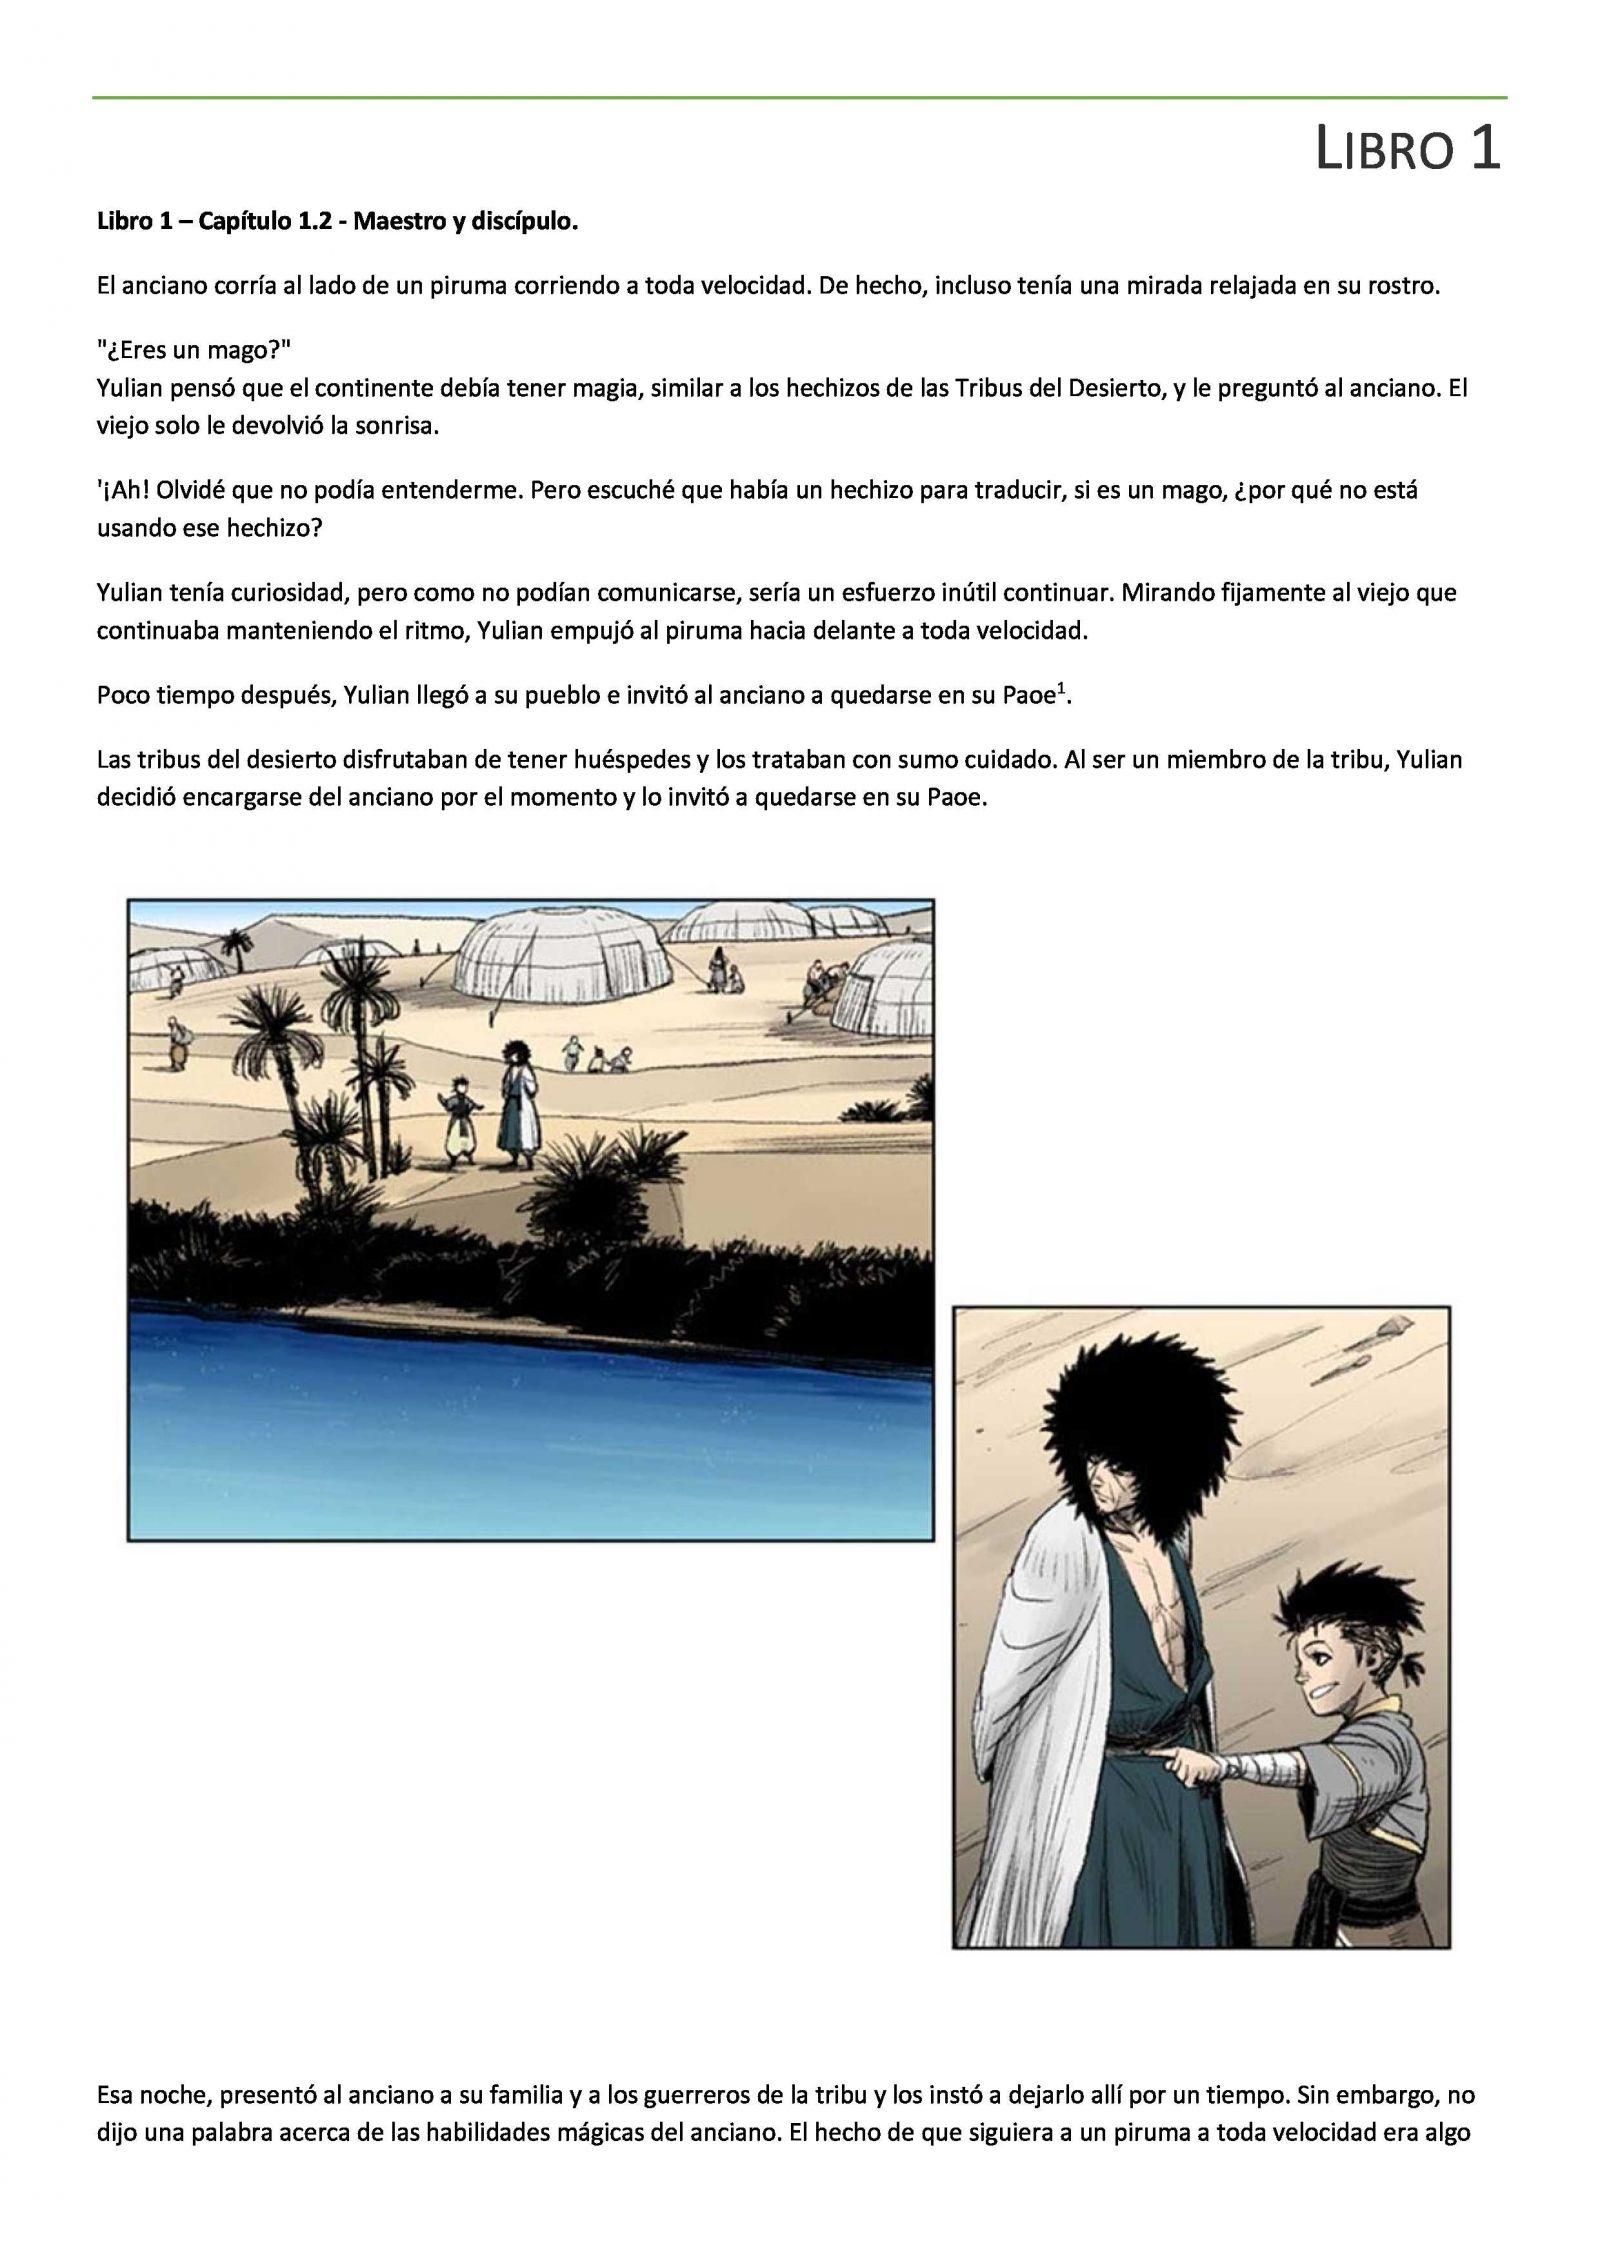 https://c9.mangatag.com/es_manga/pic4/55/24695/620724/44aa90922372632a305145827bfc1c03.jpg Page 1